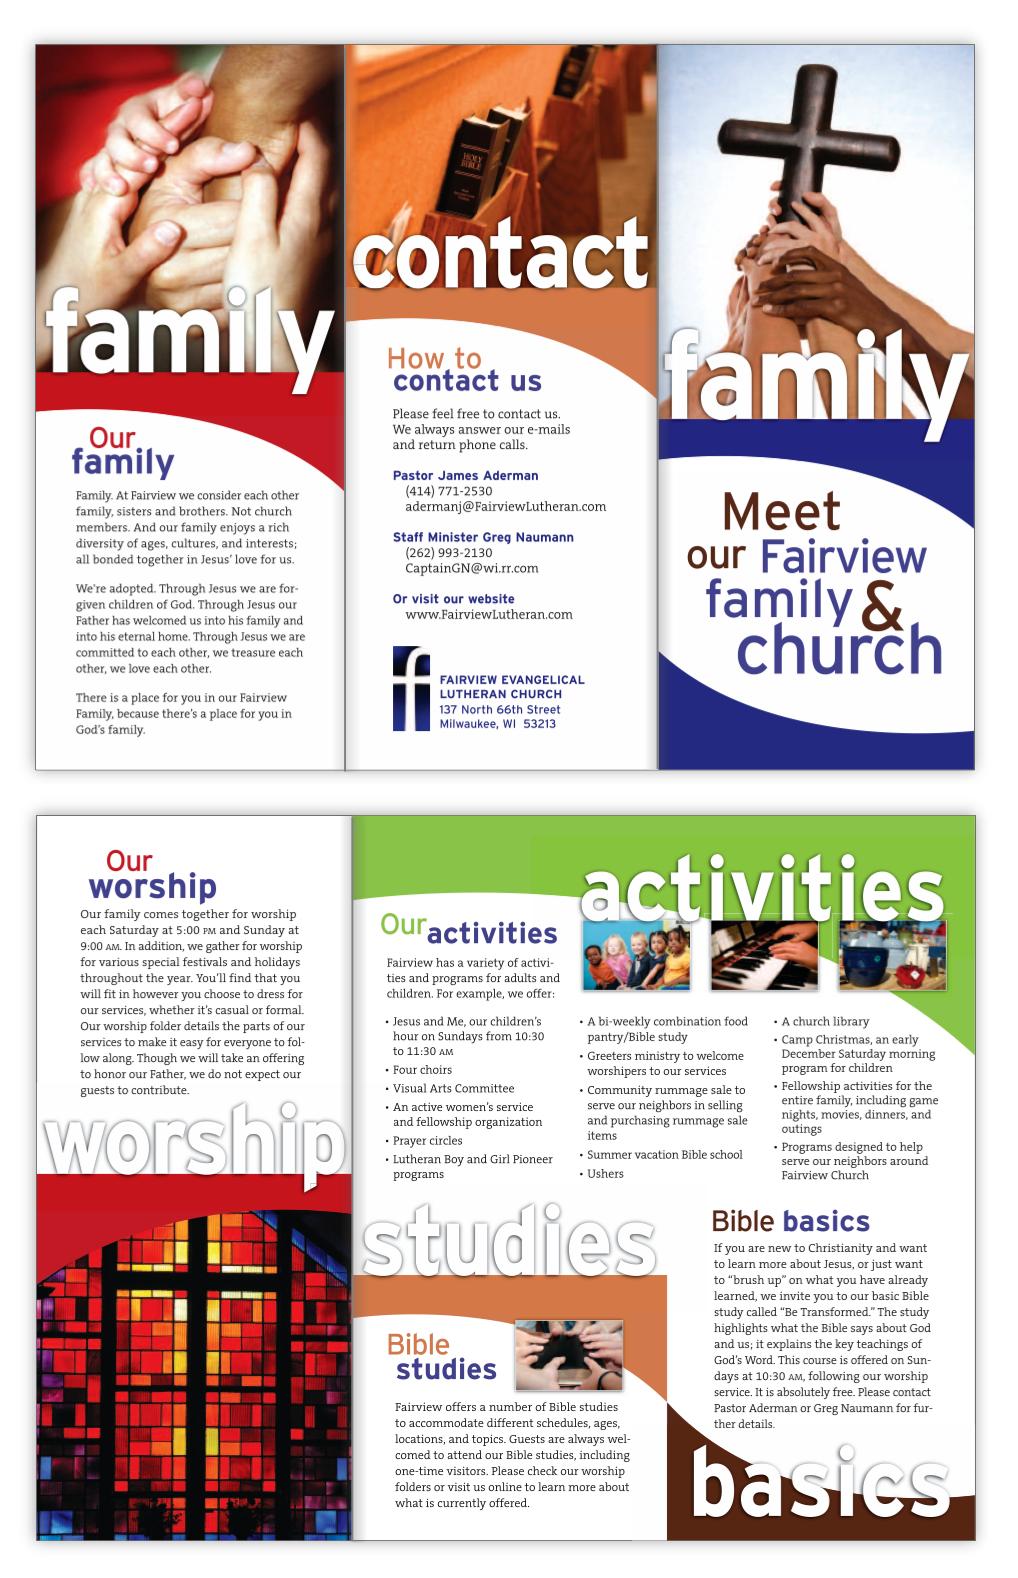 Fairview Lutheran brochure